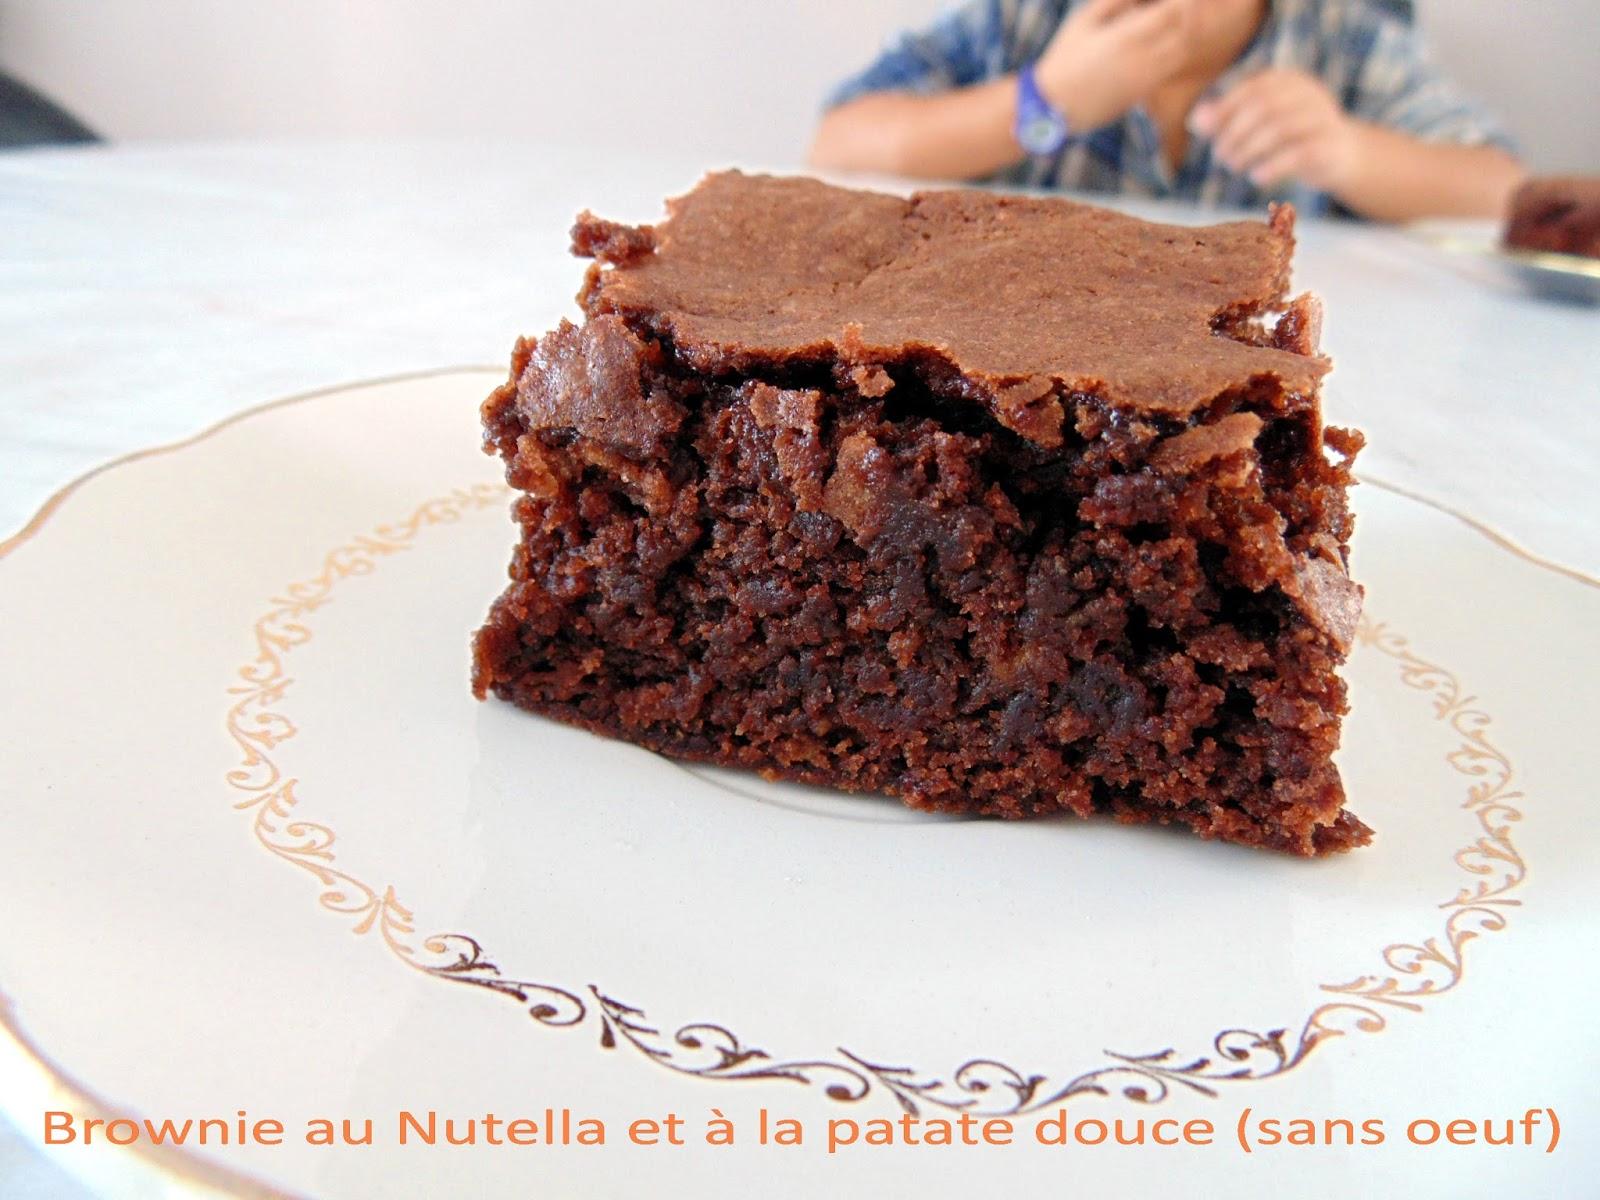 gateau gaga love cakes brownie au nutella et la. Black Bedroom Furniture Sets. Home Design Ideas